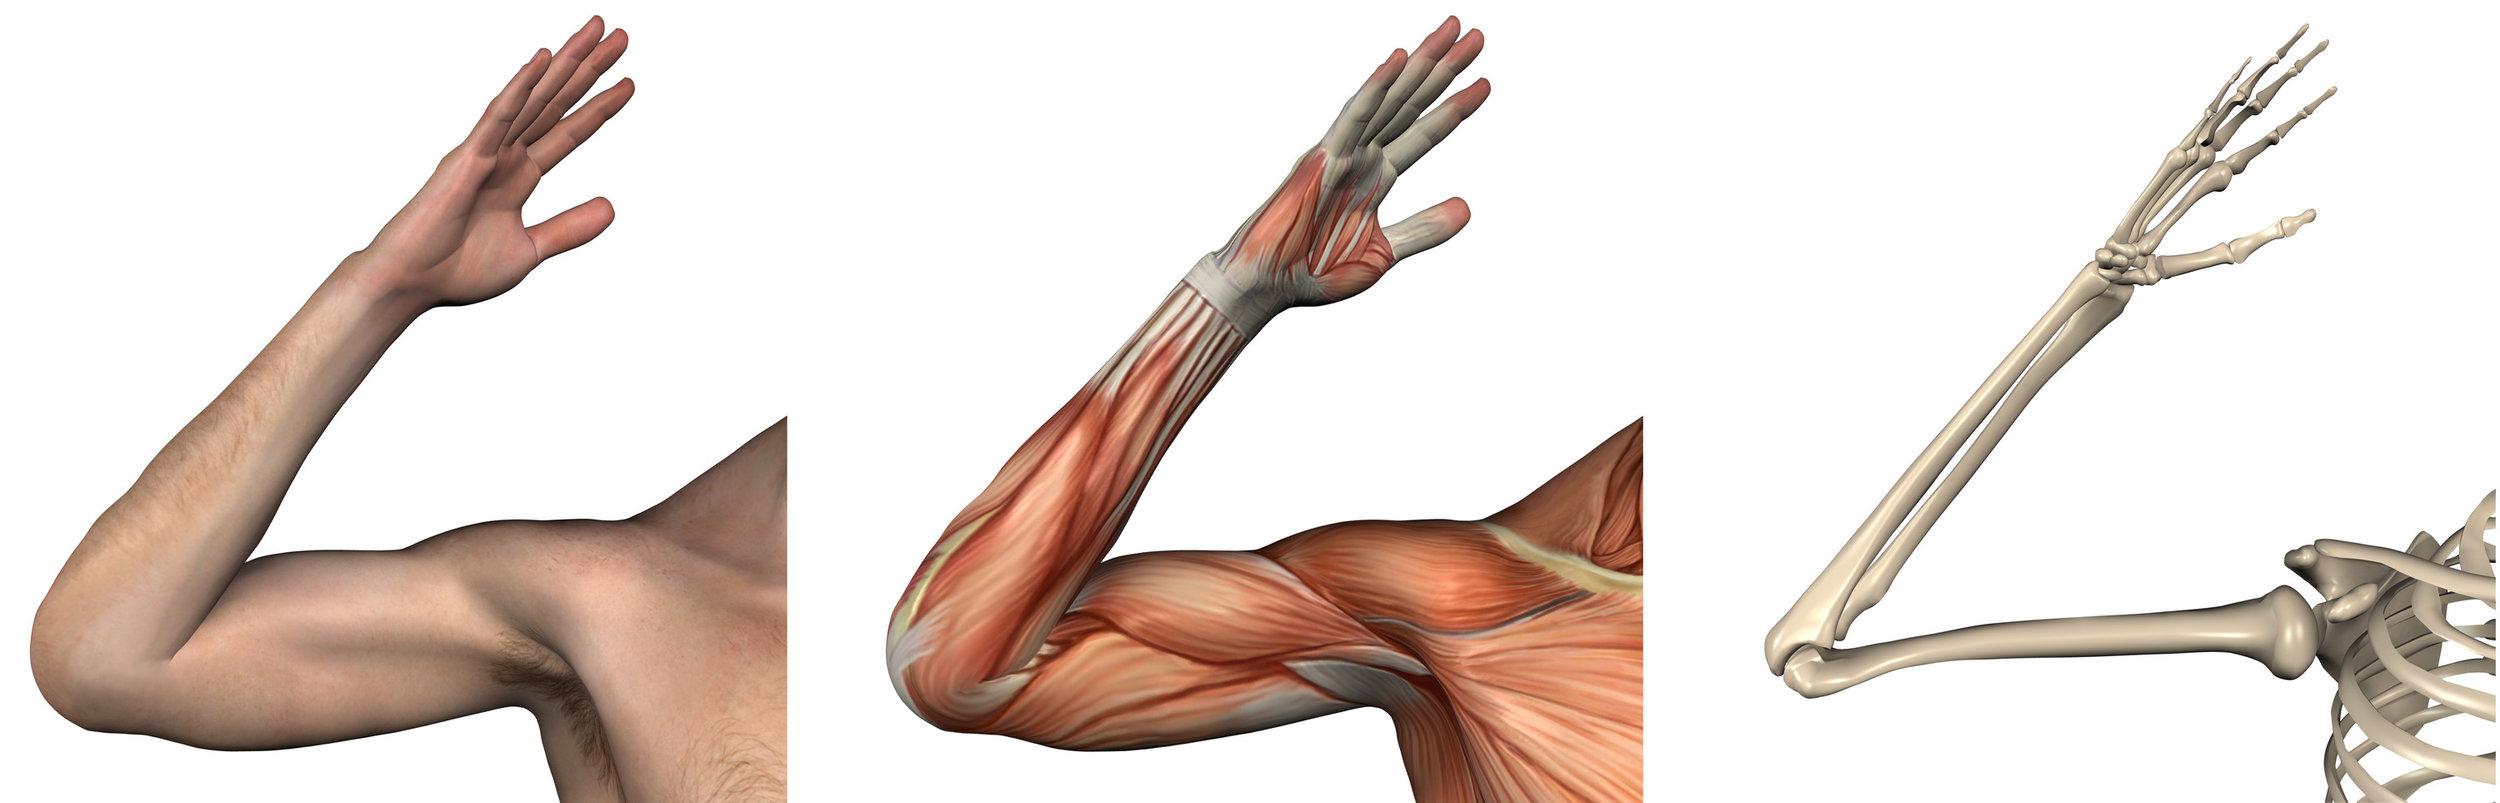 3 arms anatomy 2.jpg